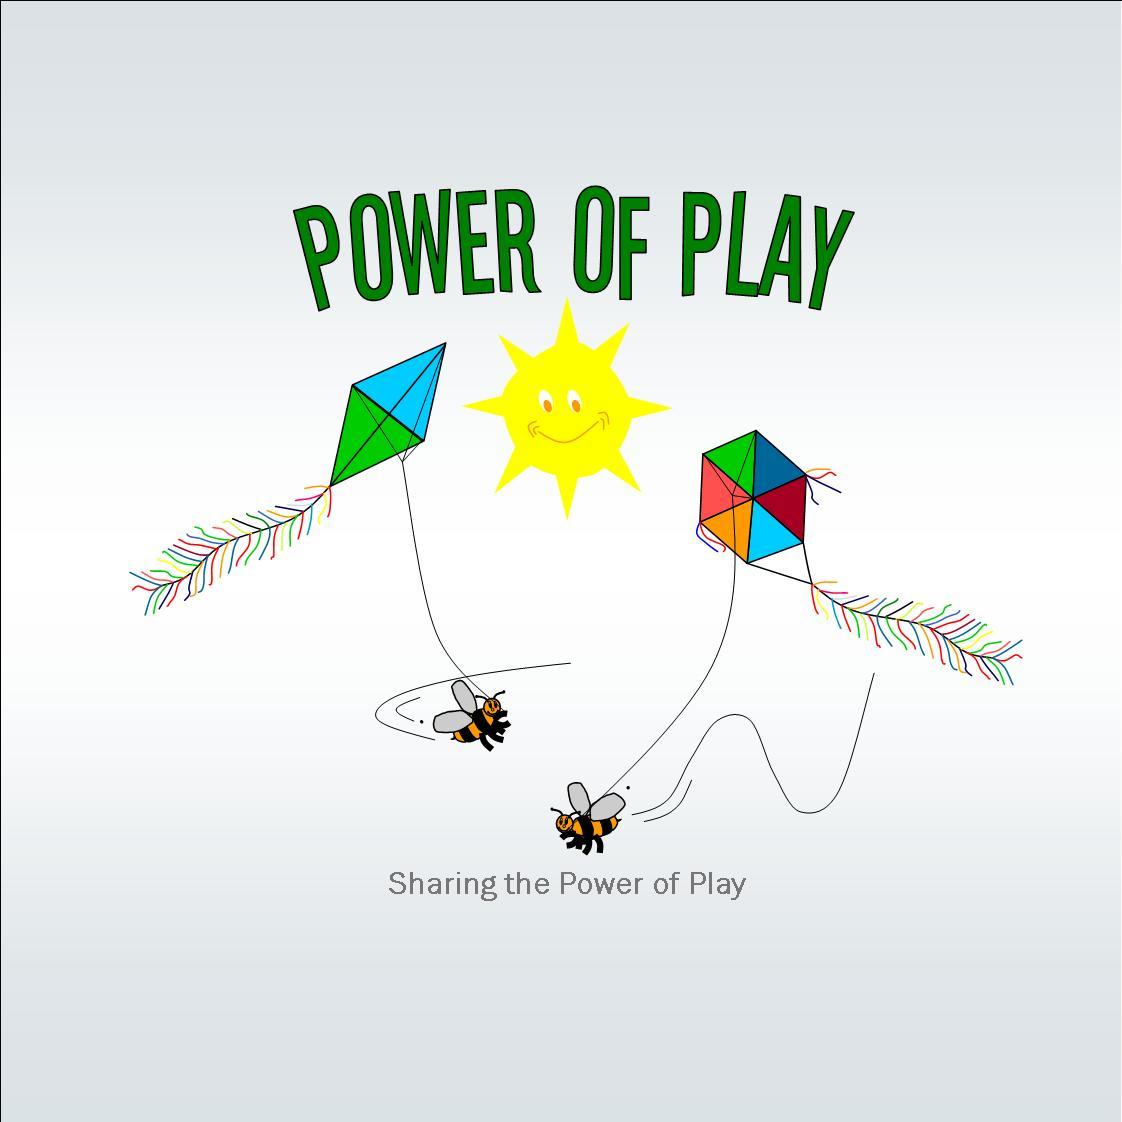 Logo Design by nk - Entry No. 49 in the Logo Design Contest Power Of Play Logo Design.